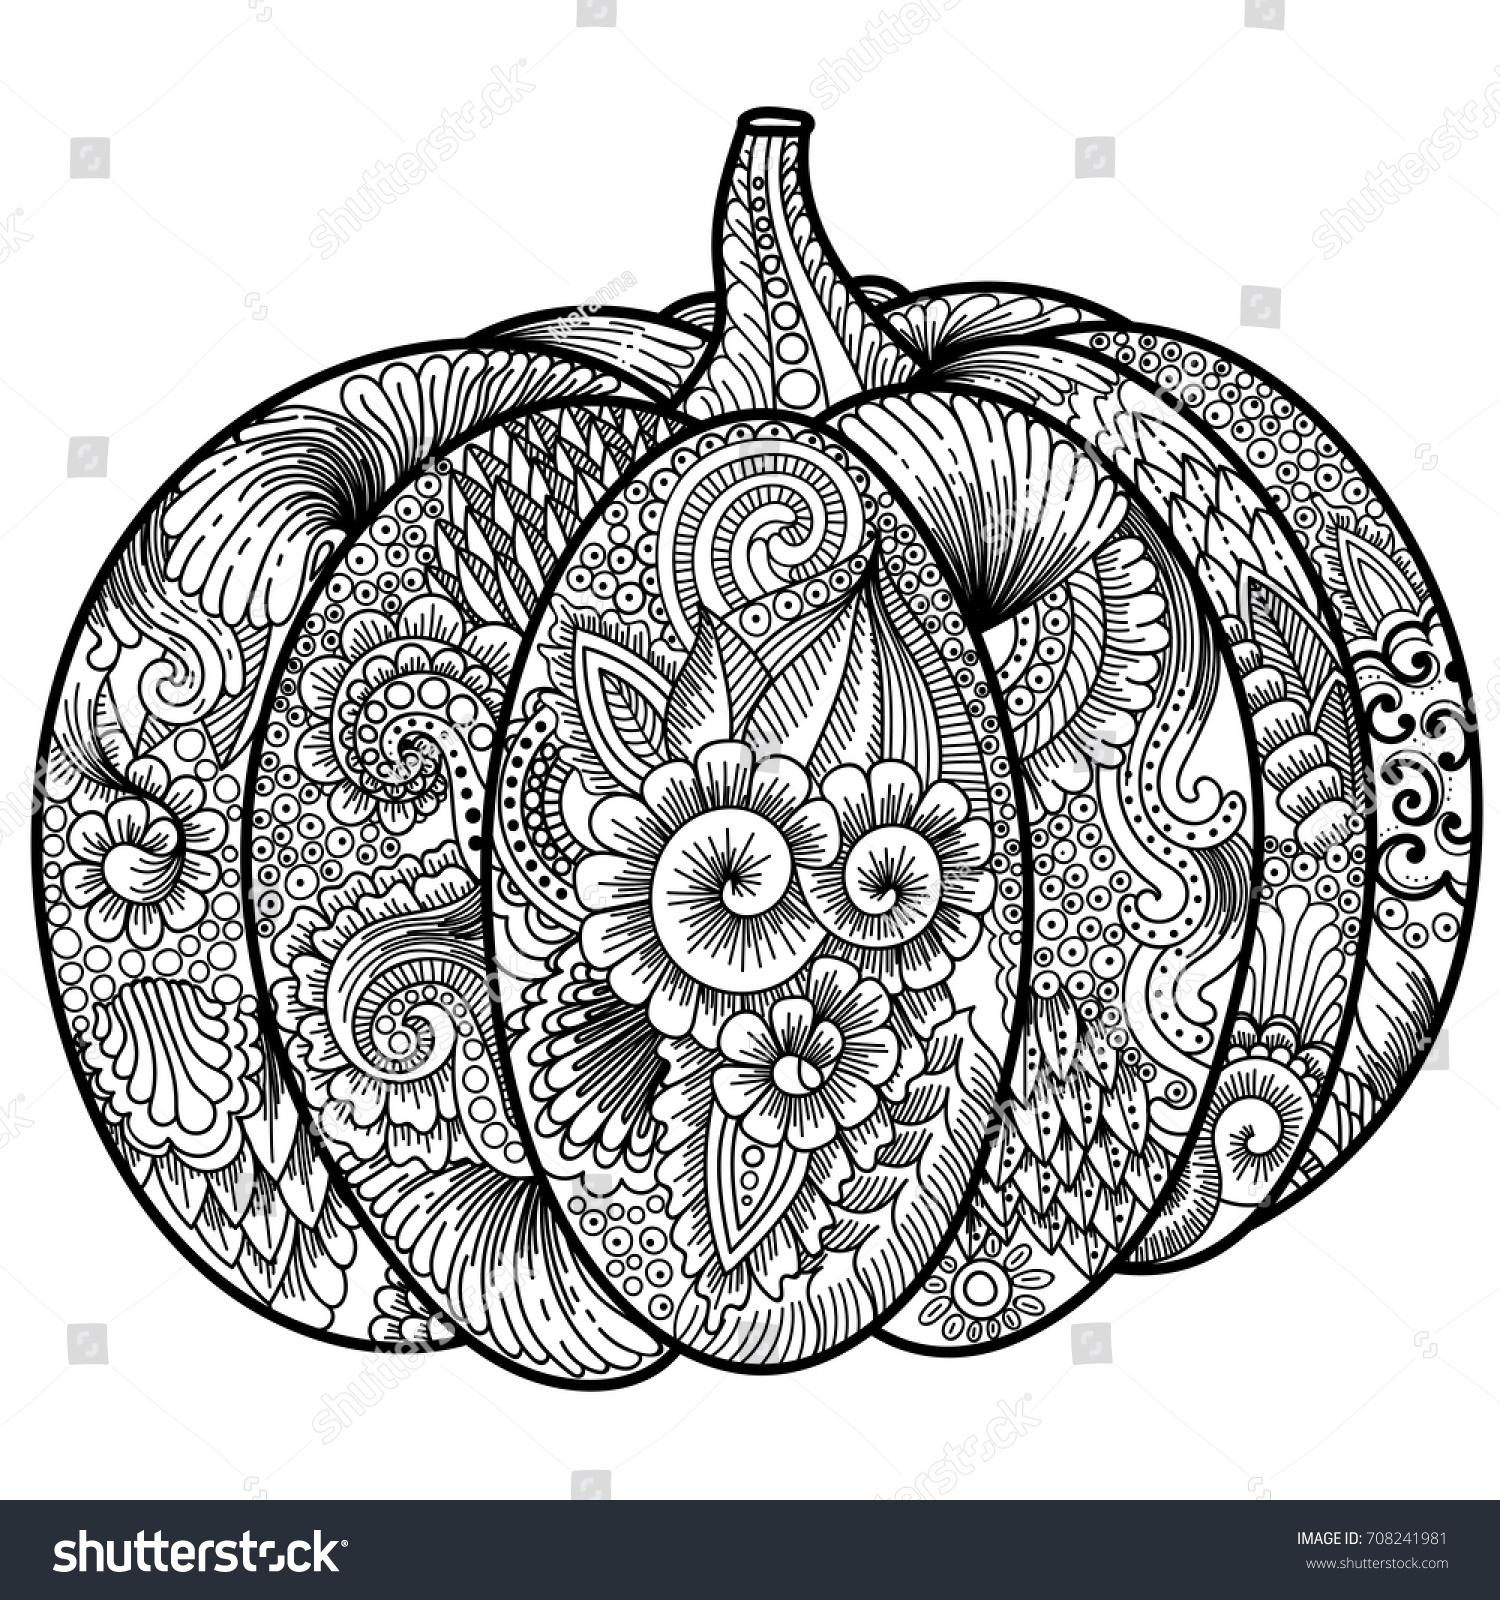 Halloween Pumpkin Coloring Book Adult Antistress Stock Vector HD ...